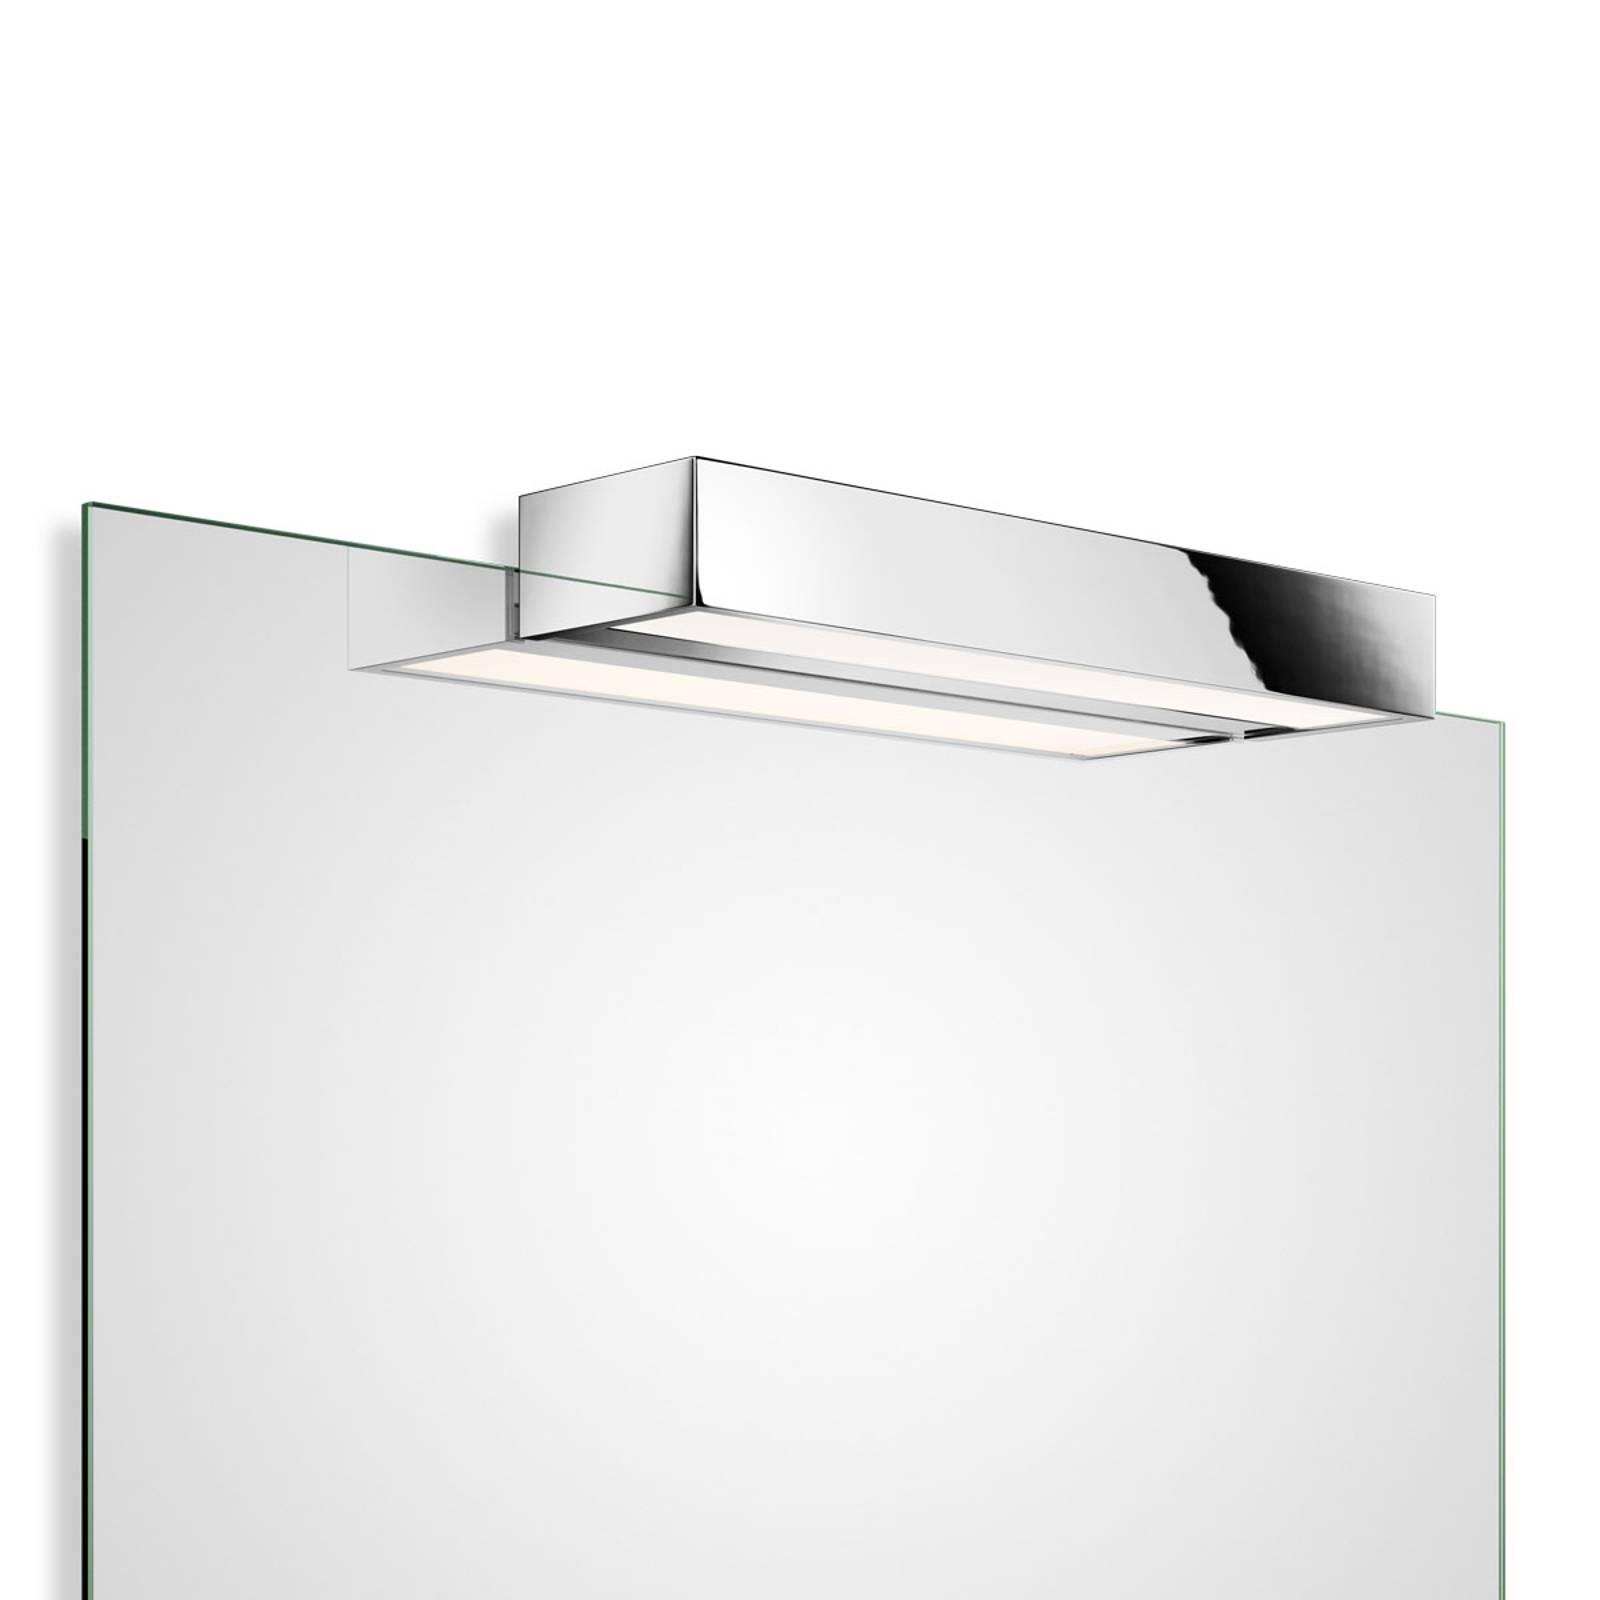 Decor Walther Box 1-40 N -LED-peililamppu 3 000 K